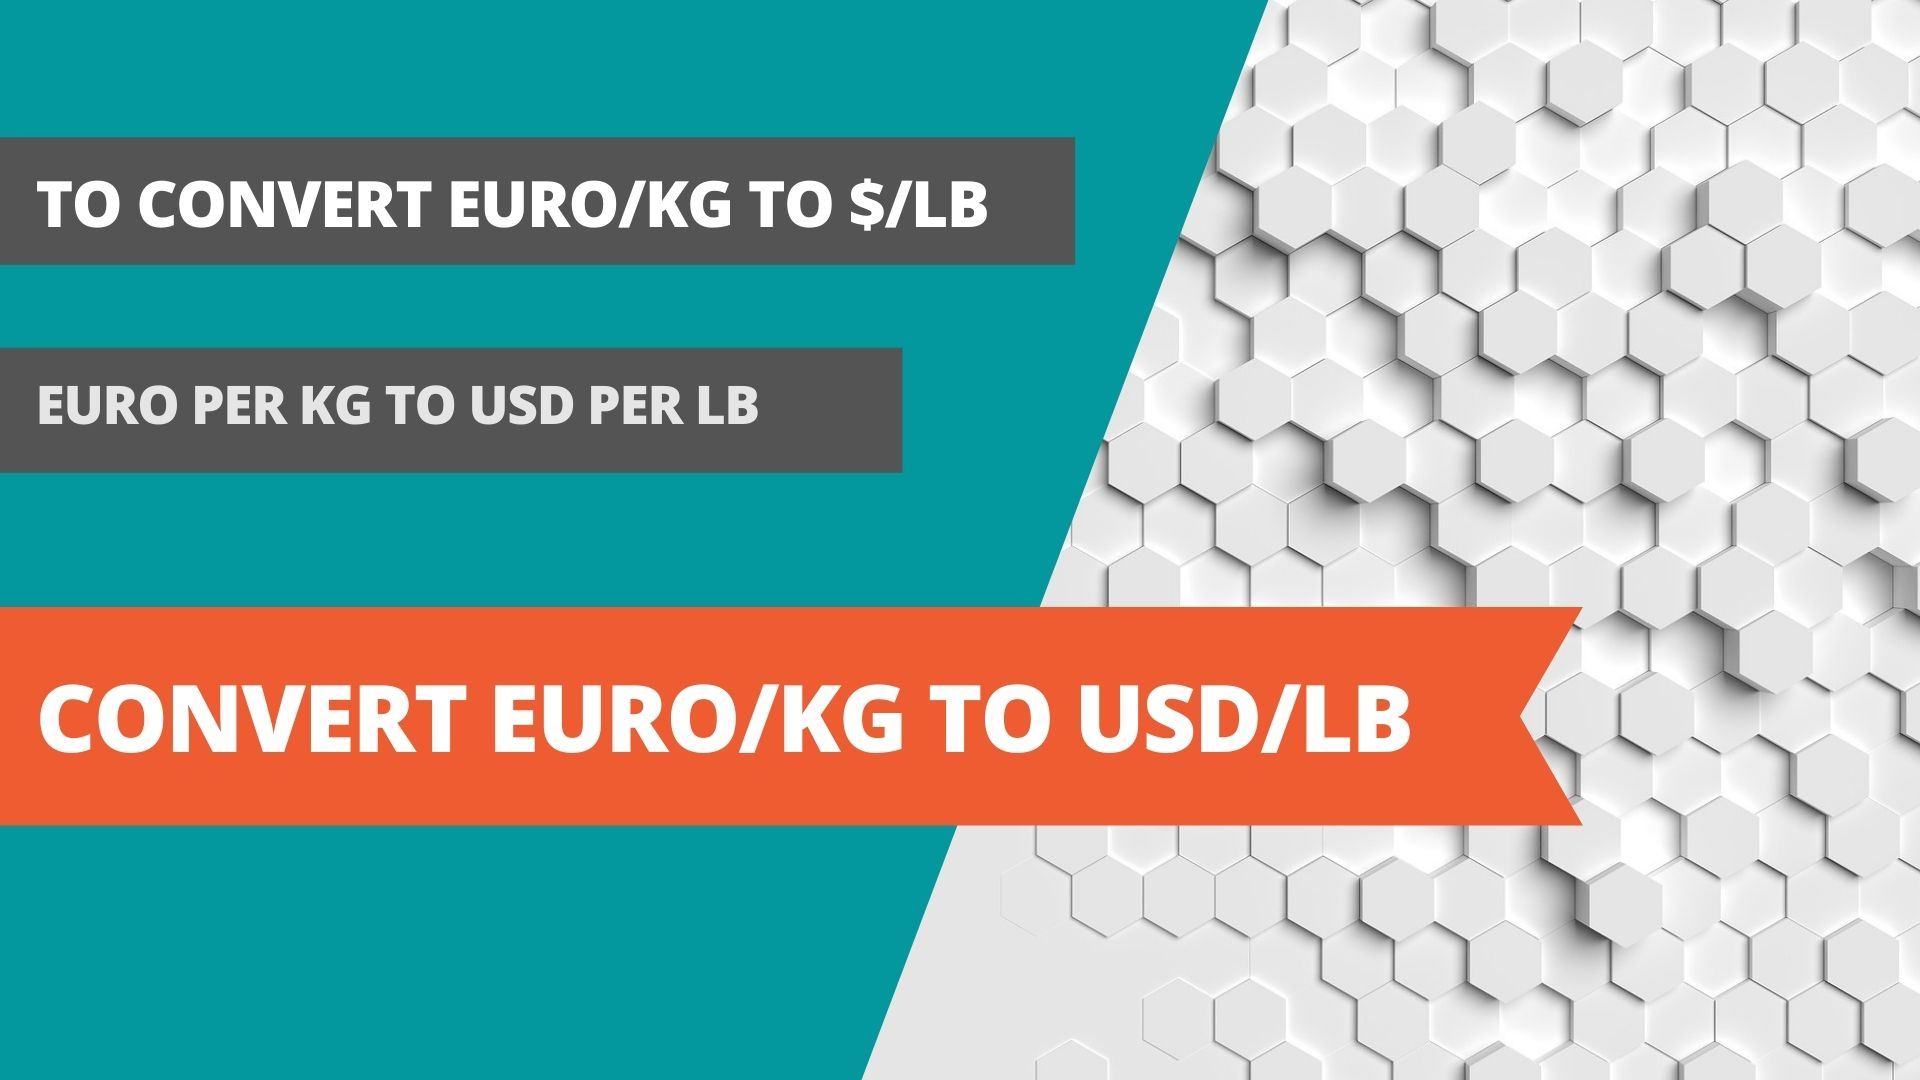 Convert euro/kg to usd/lb